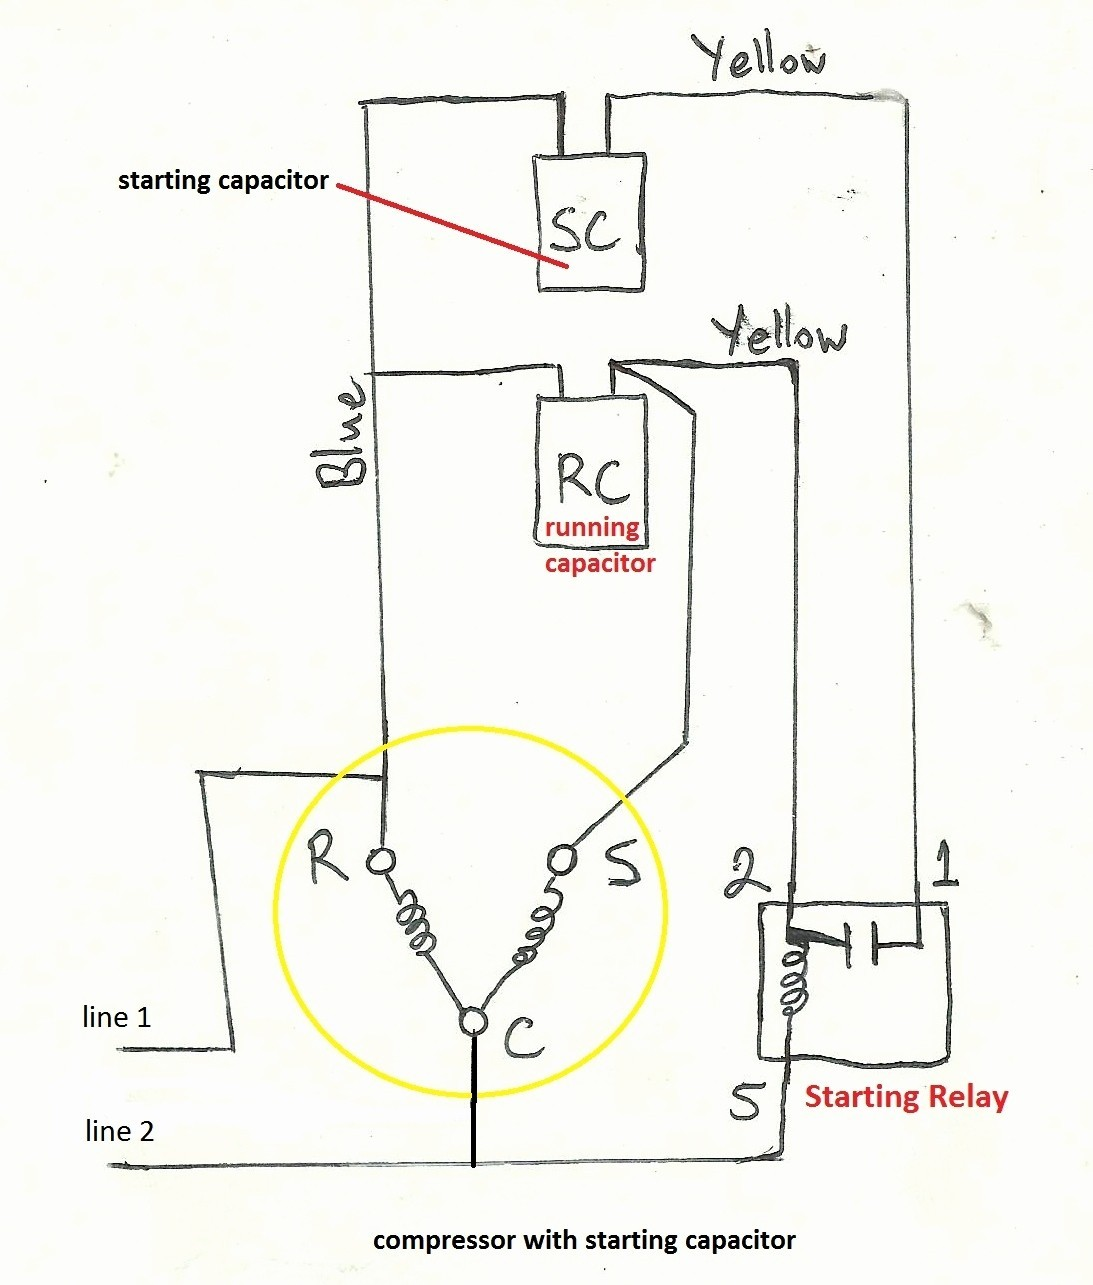 tecumseh pressor wiring diagram inspirational wiring diagram ac capacitor wiring diagram fresh 4 wire and 3 wire of tecumseh pressor wiring diagram